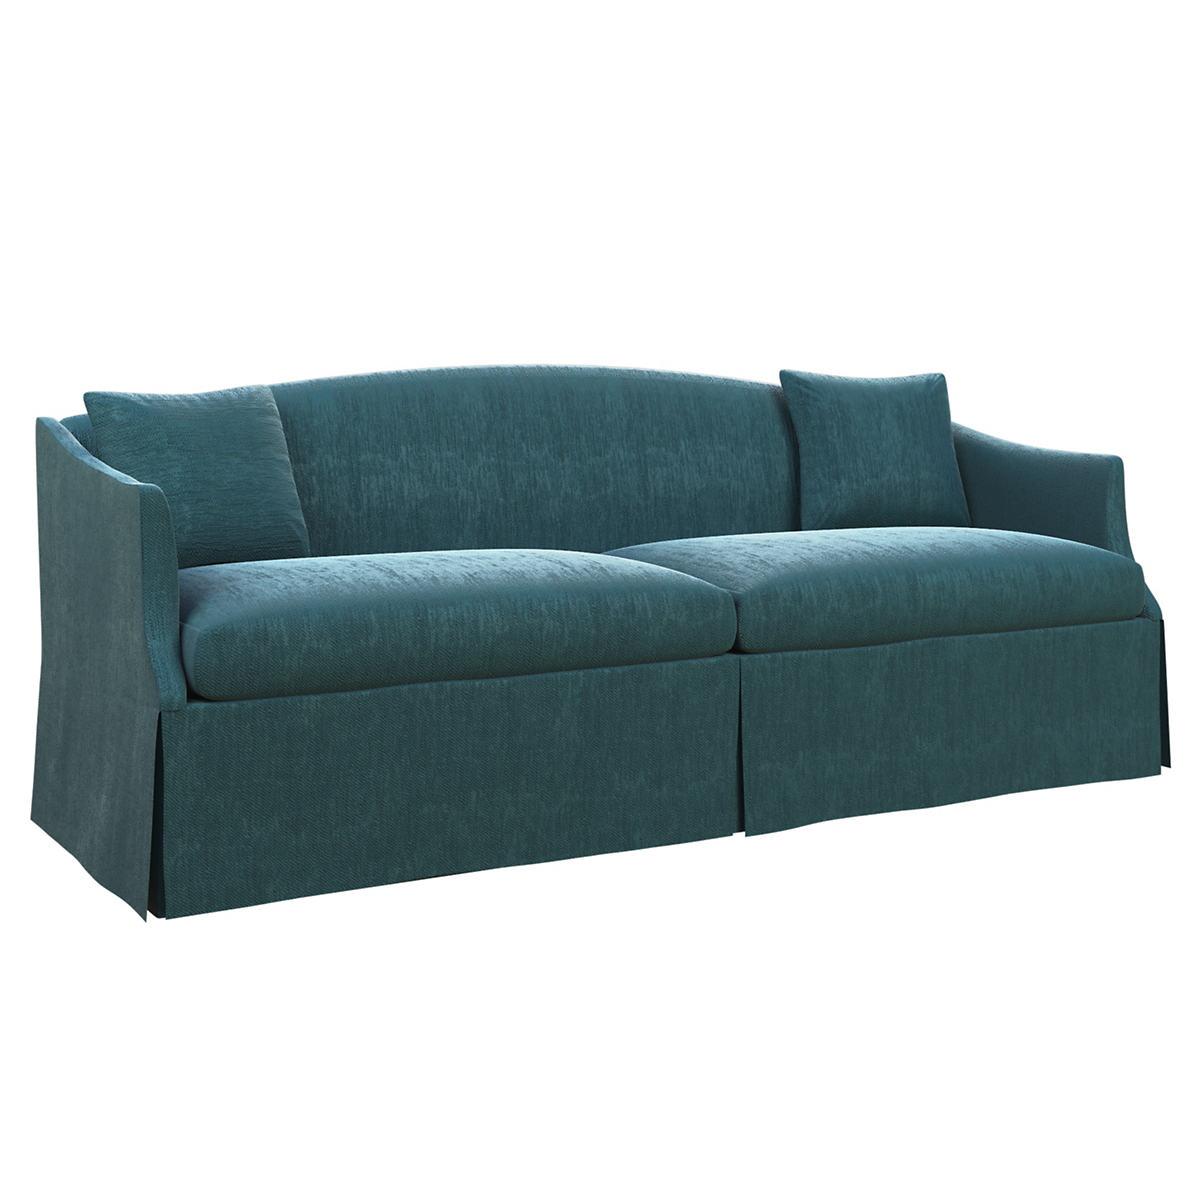 Plush Velvet Sapphire Avignon Sofa